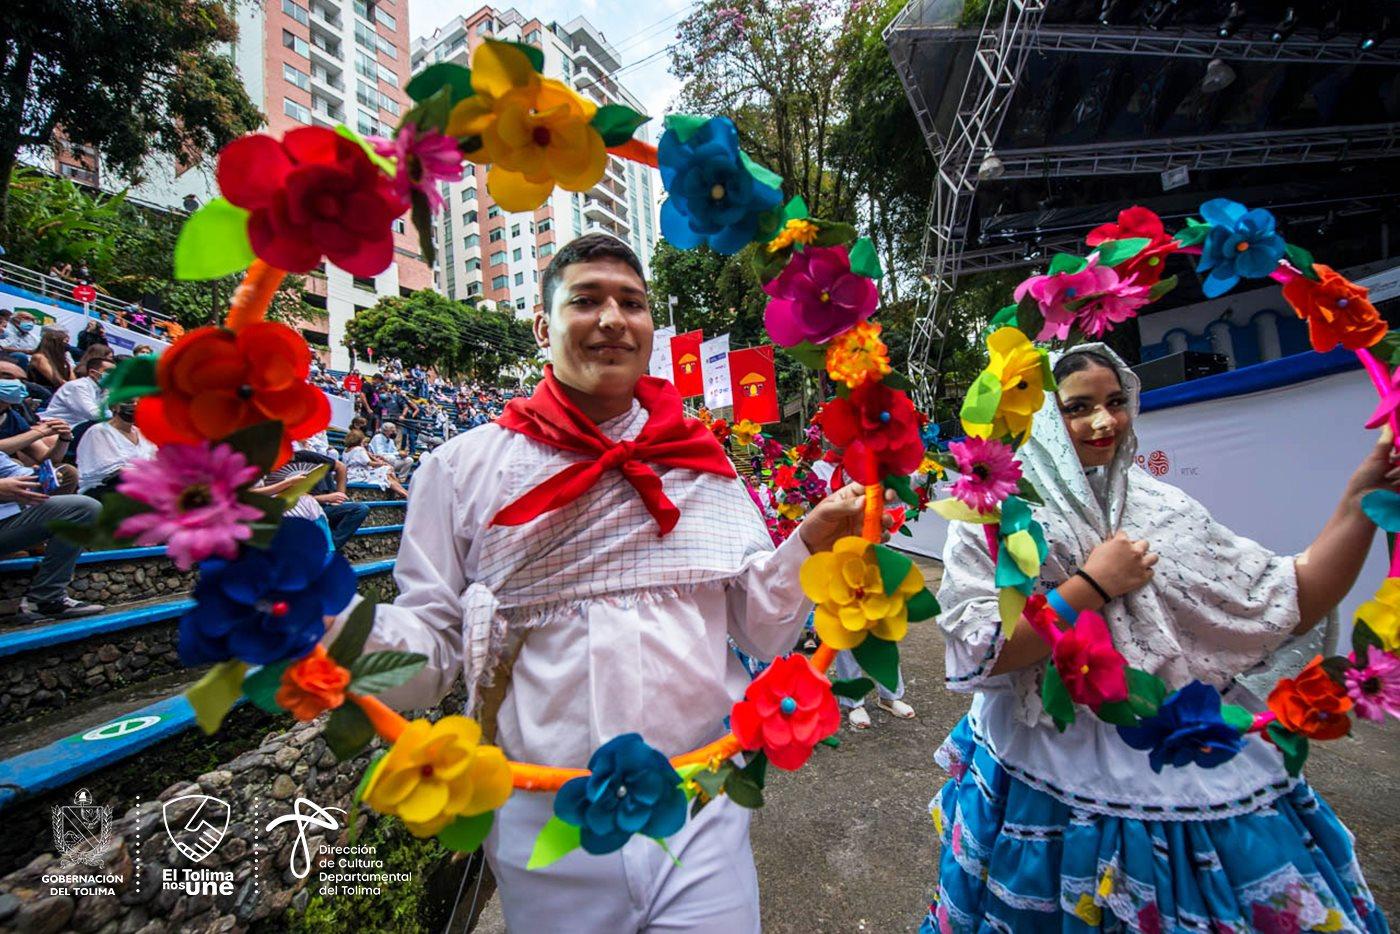 Se abre convocatoria al Festival de Música Colombiana 2022 | EL FRENTE